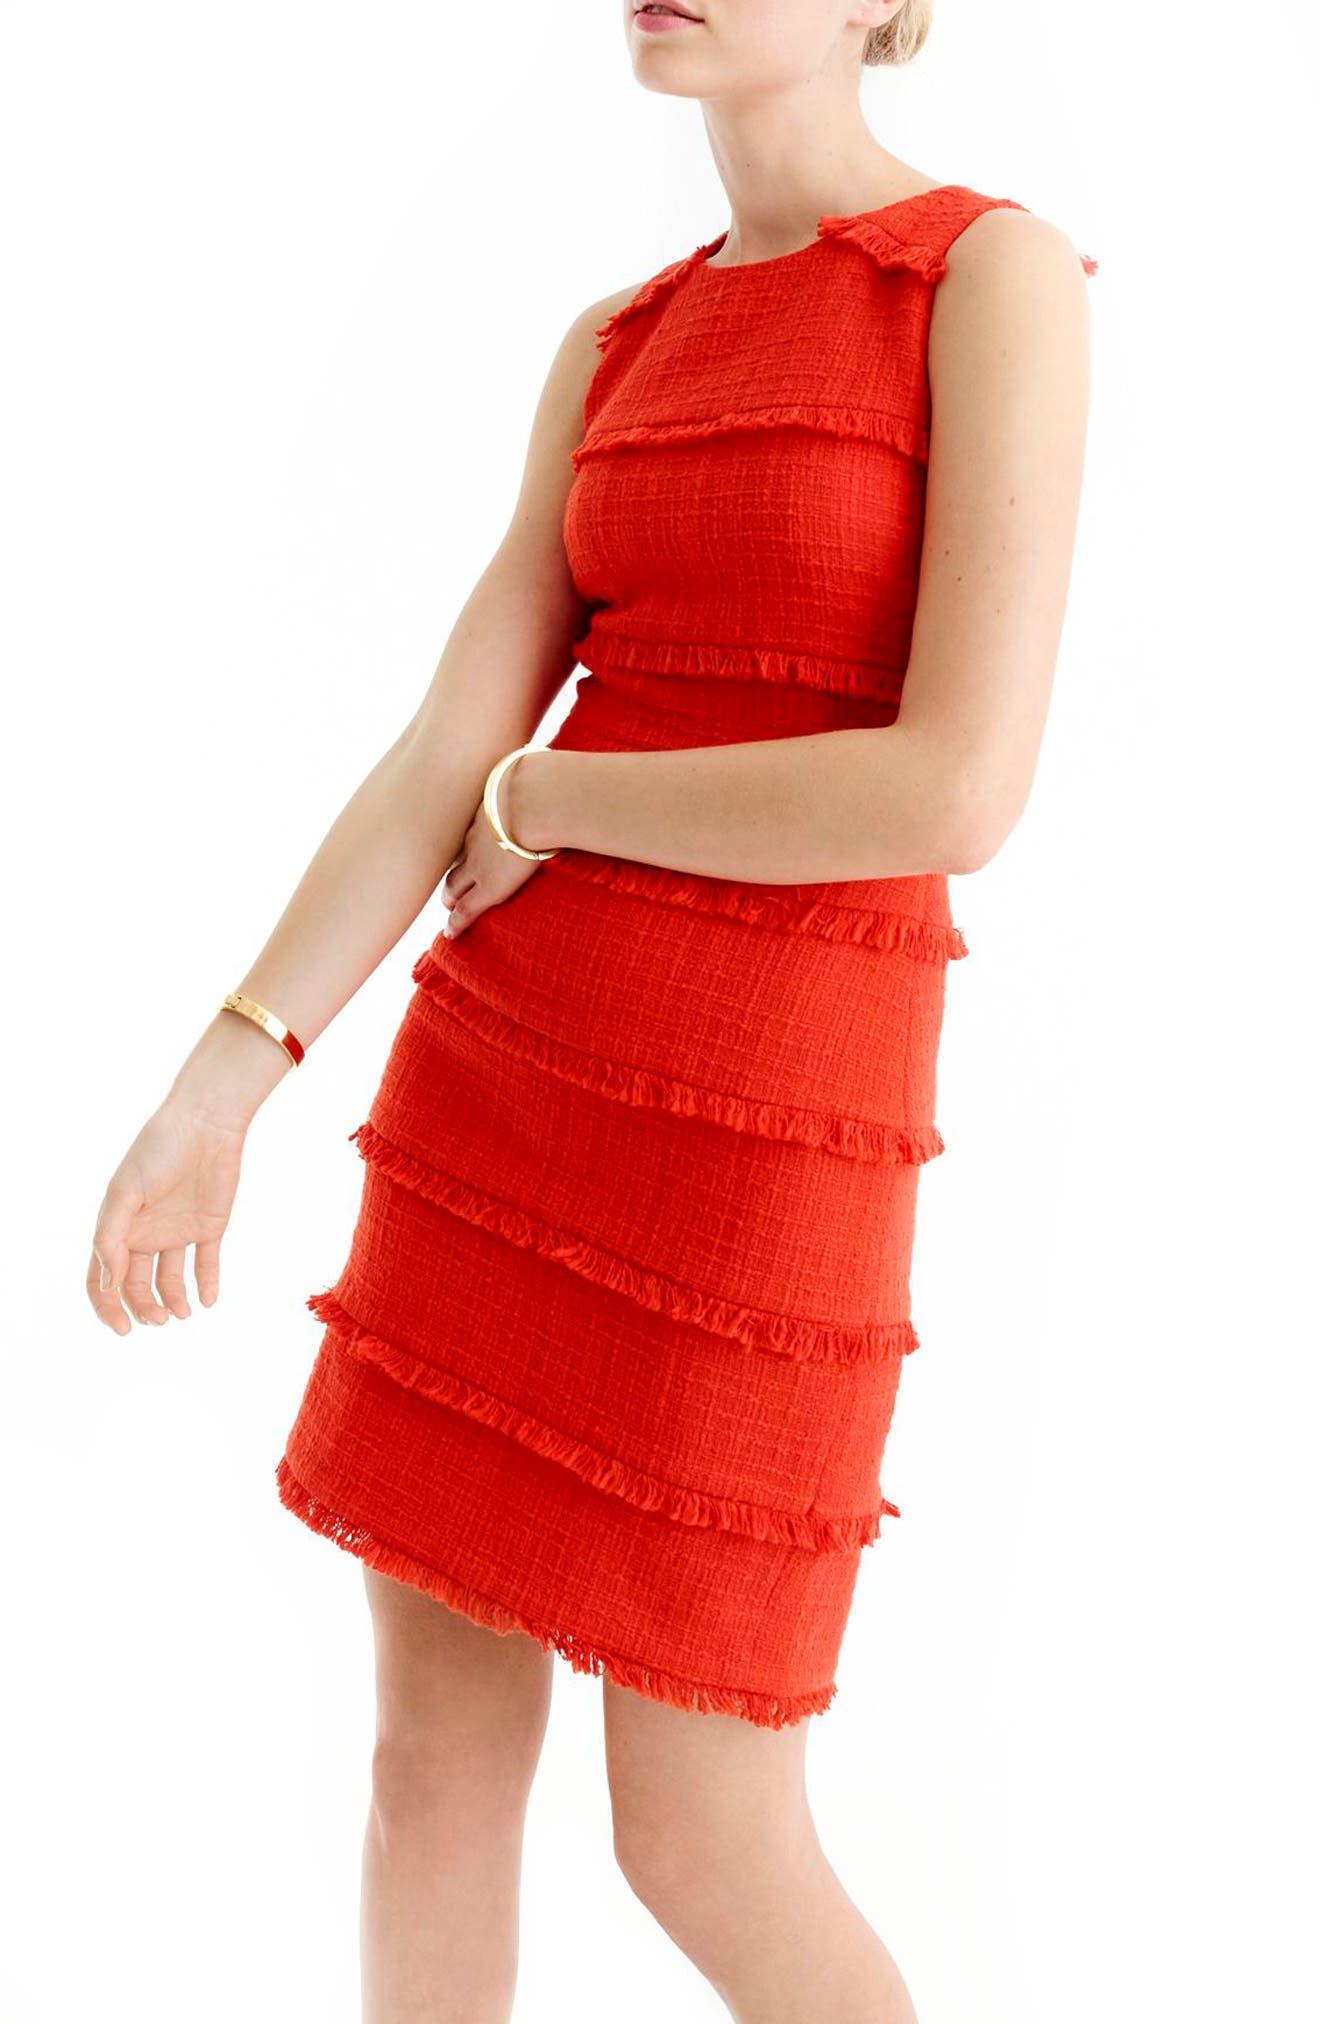 Alternate Image 1 Selected - J.Crew Tweed Sheath Dress (Regular & Petite)